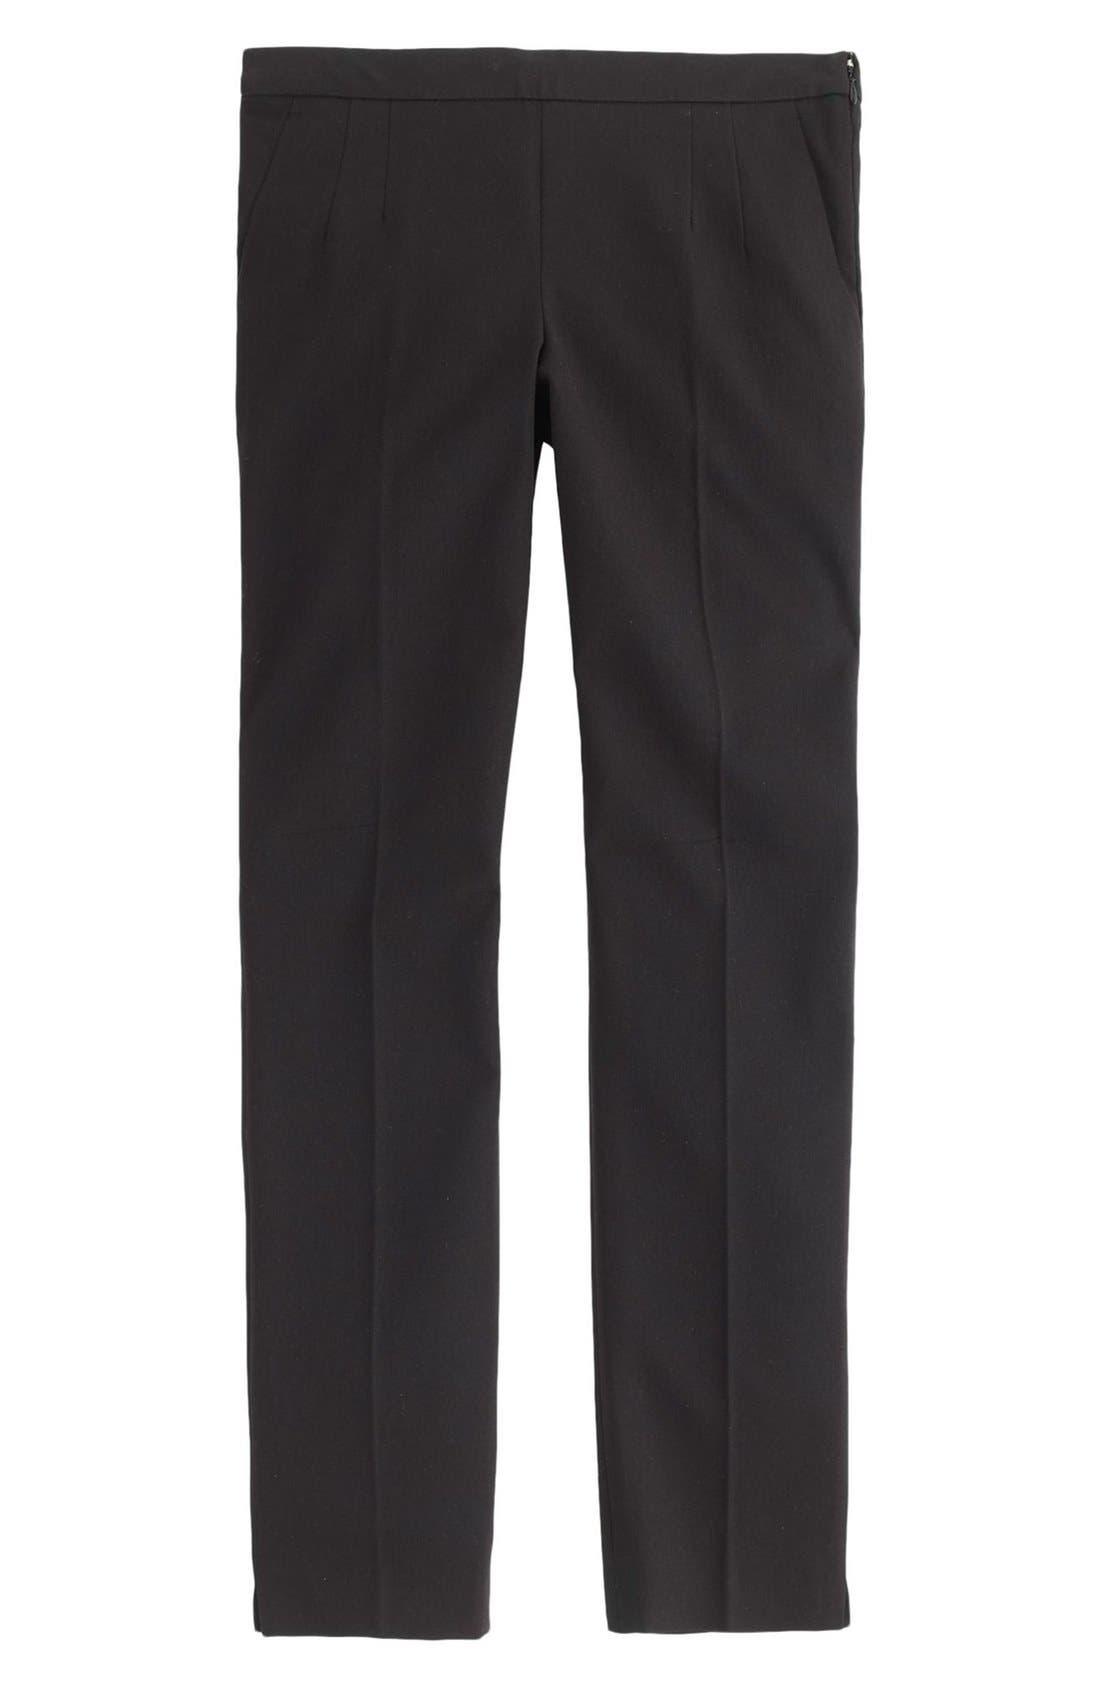 Alternate Image 3  - J.Crew 'Martie' Bi-Stretch Cotton Blend Pants (Regular & Petite)